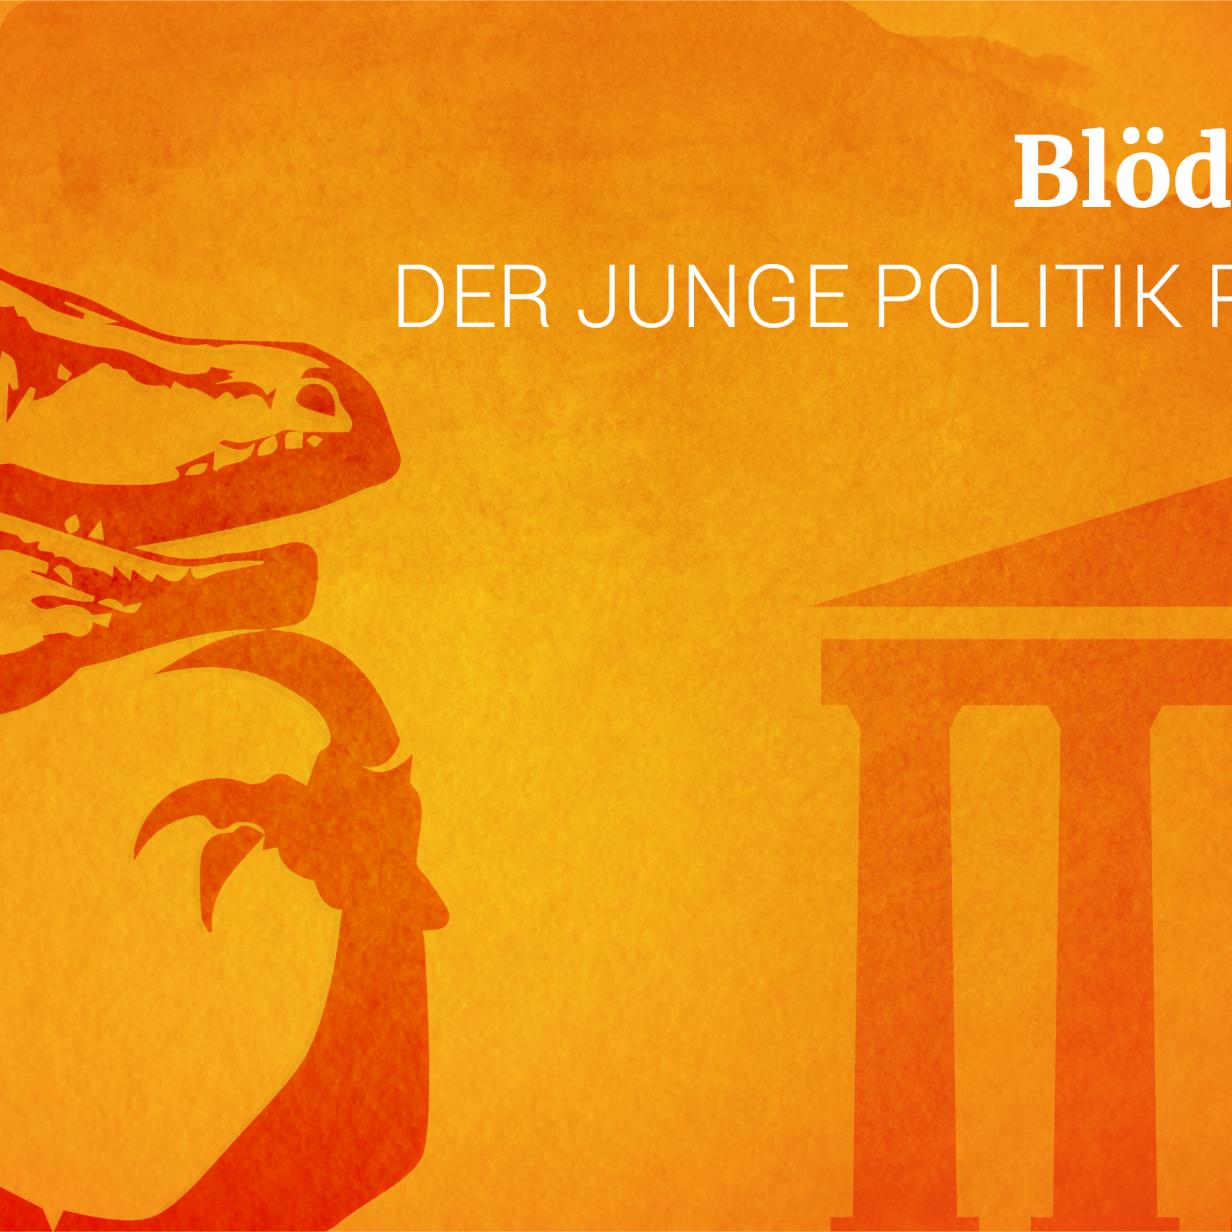 Erste Folge des Politik-Podcasts: Warum wählen wir im September?